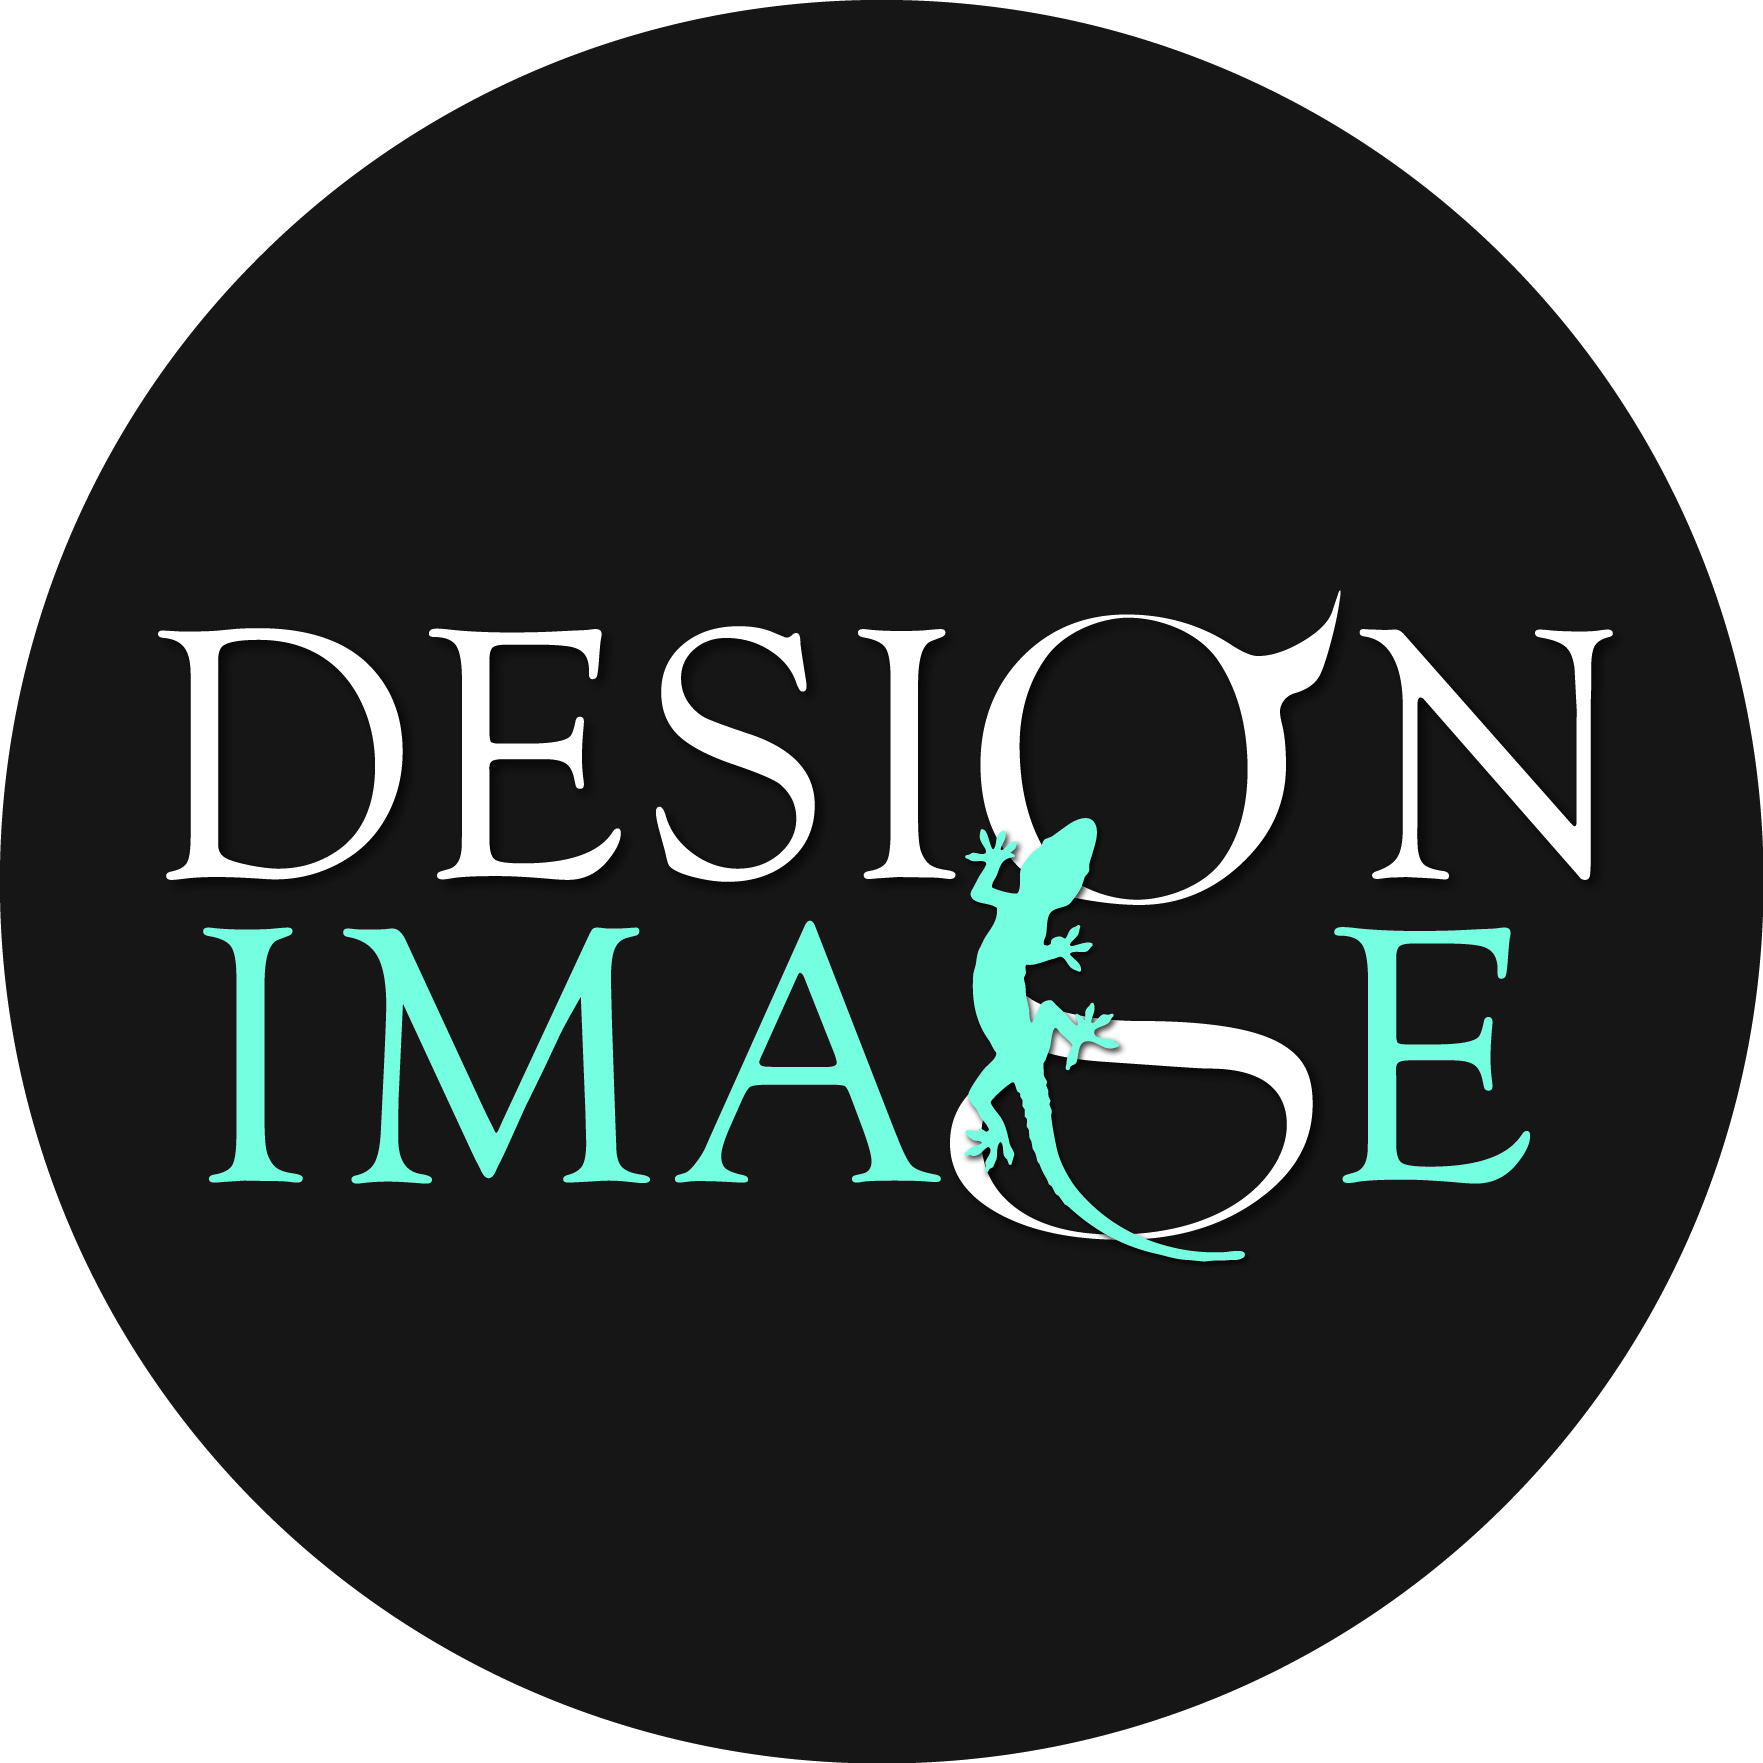 Logo of Design Image Ltd